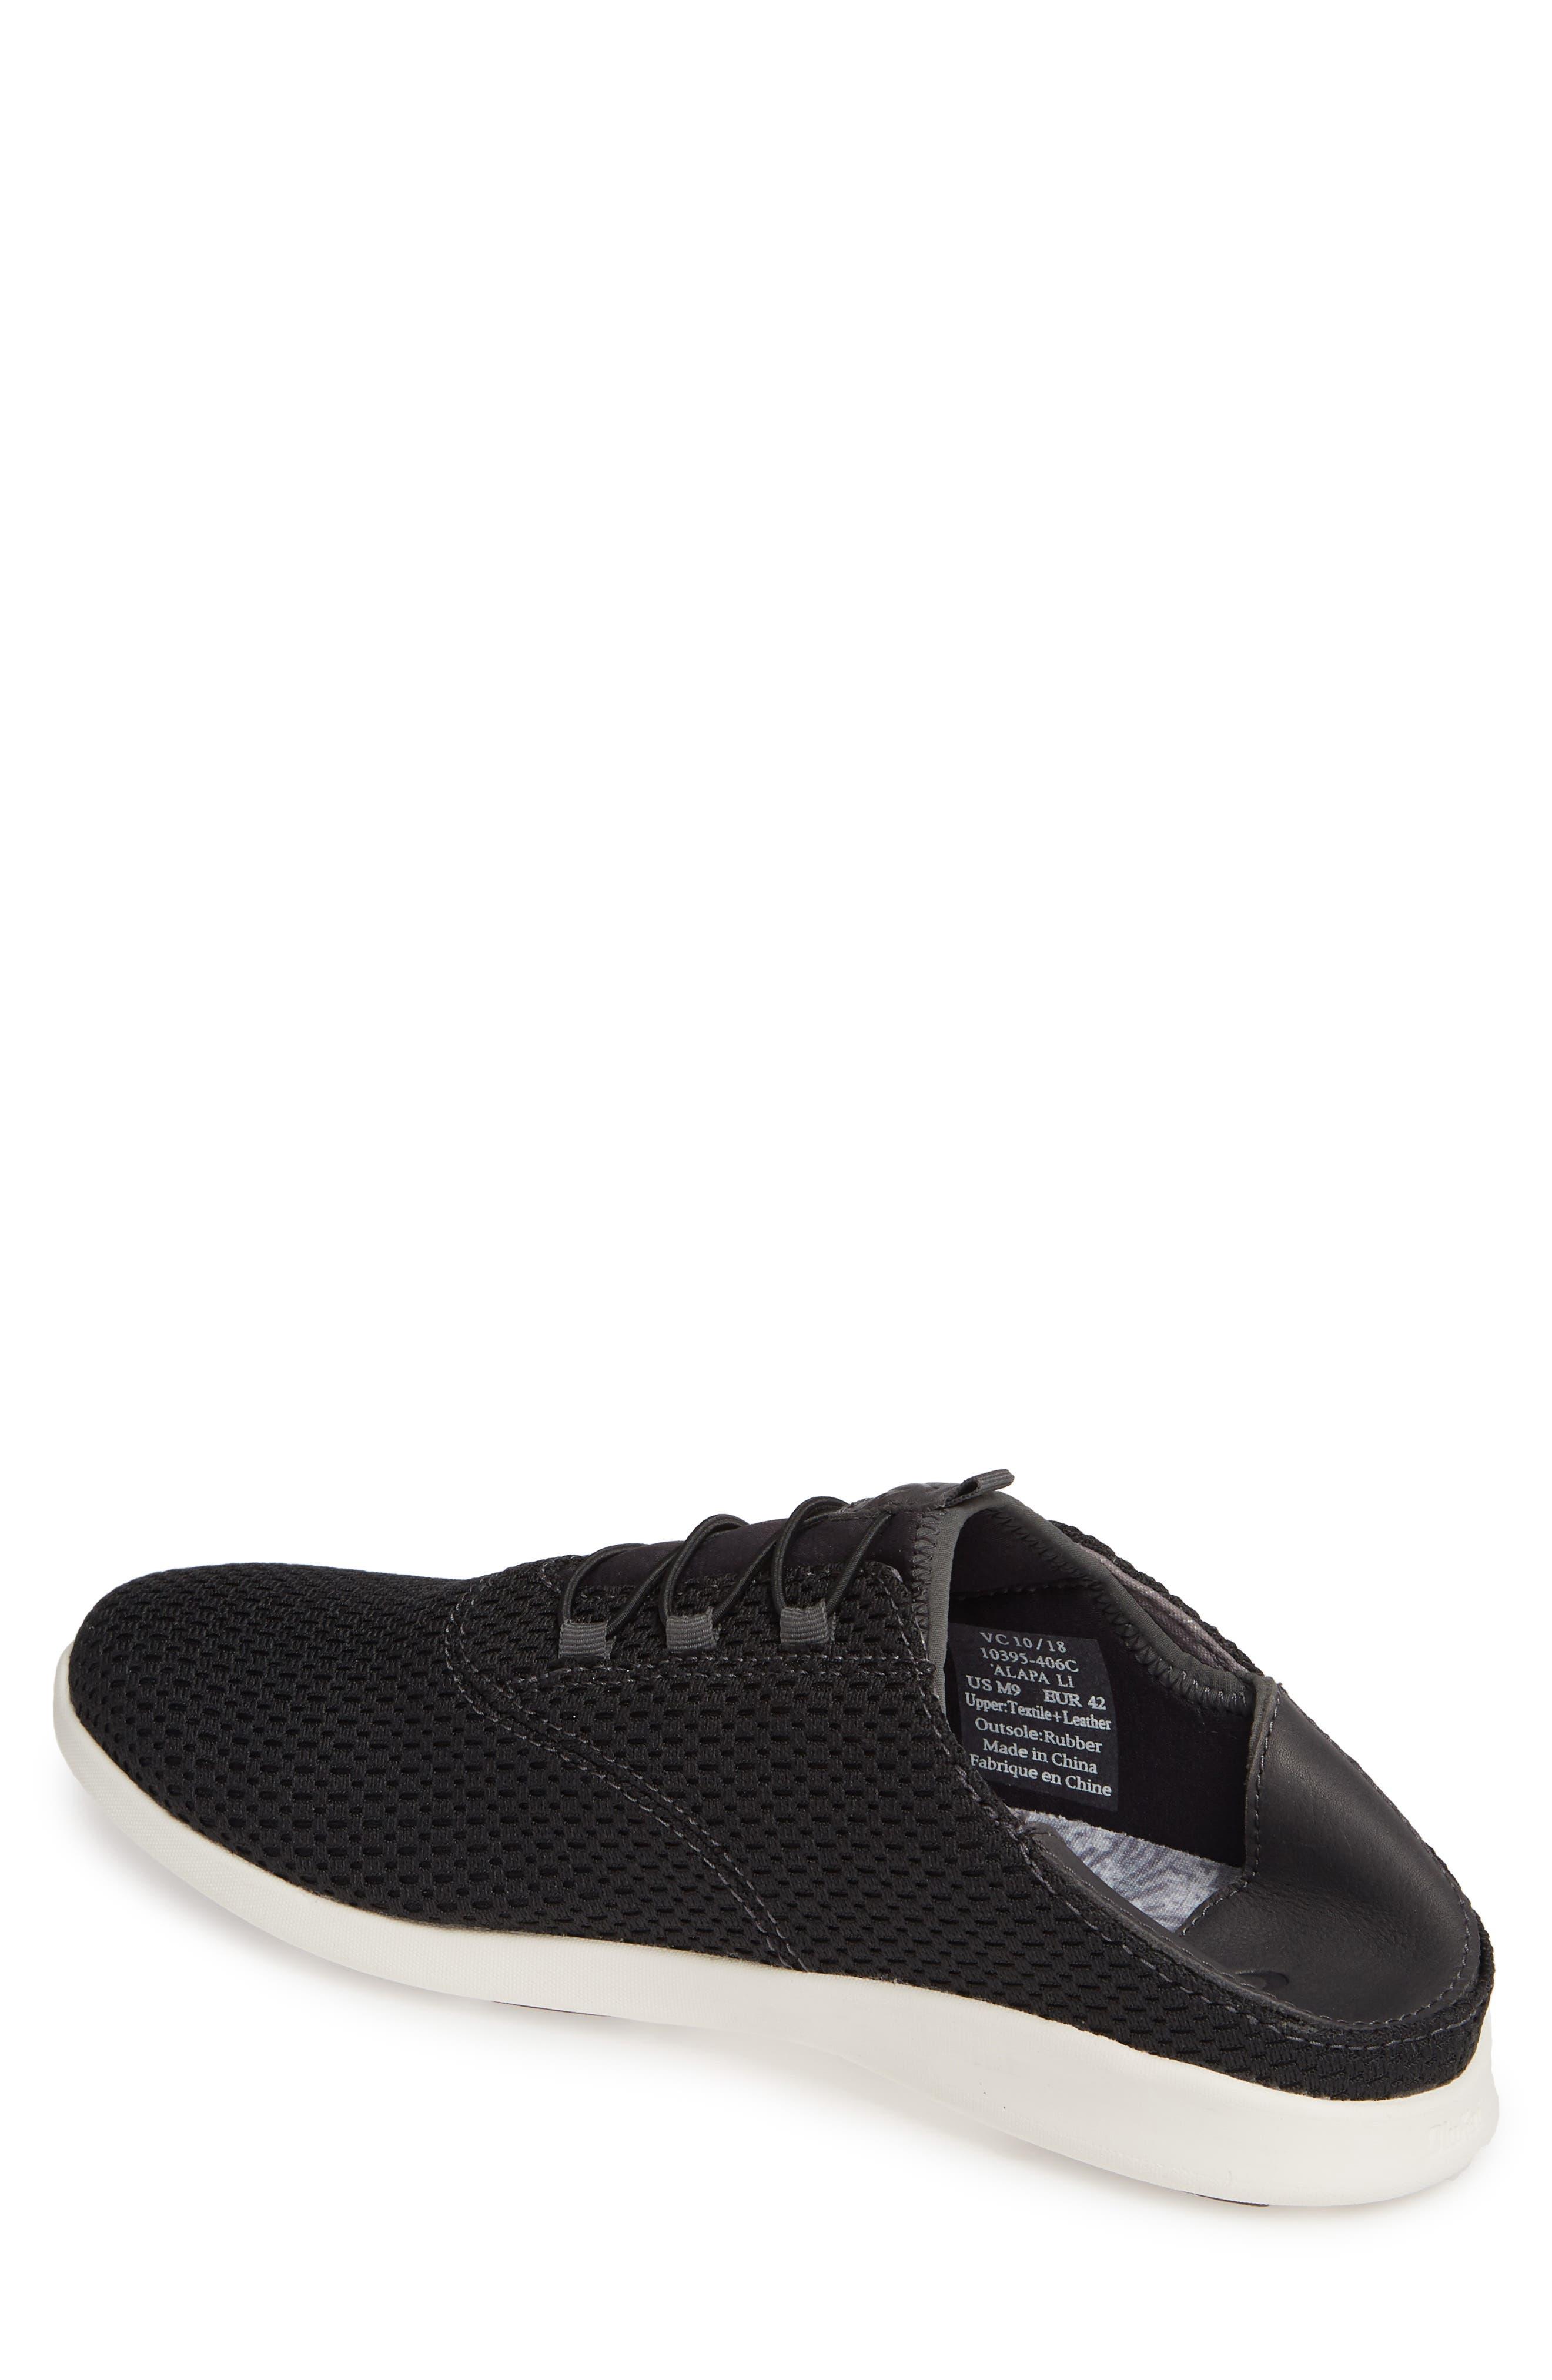 OLUKAI, Alapa Li Sneaker, Alternate thumbnail 3, color, BLACK/ DARK SHADOW MESH